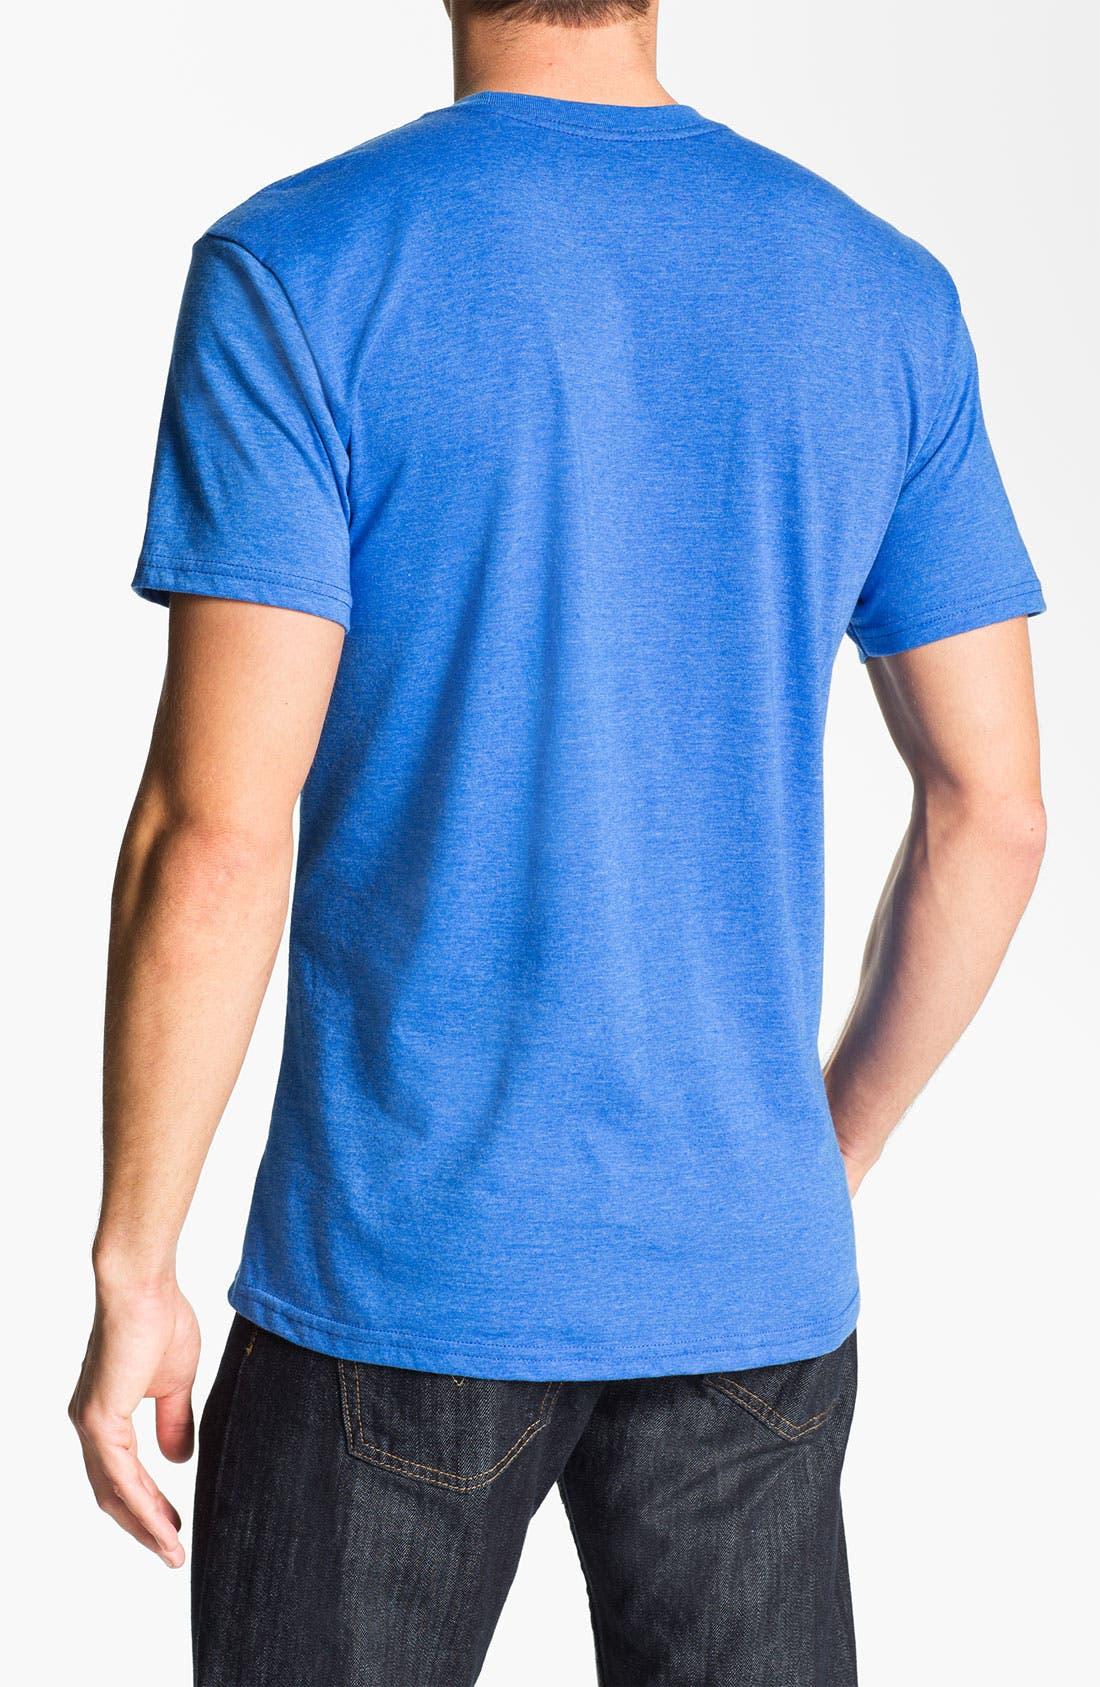 Alternate Image 2  - Burton 'Flake' Graphic T-Shirt